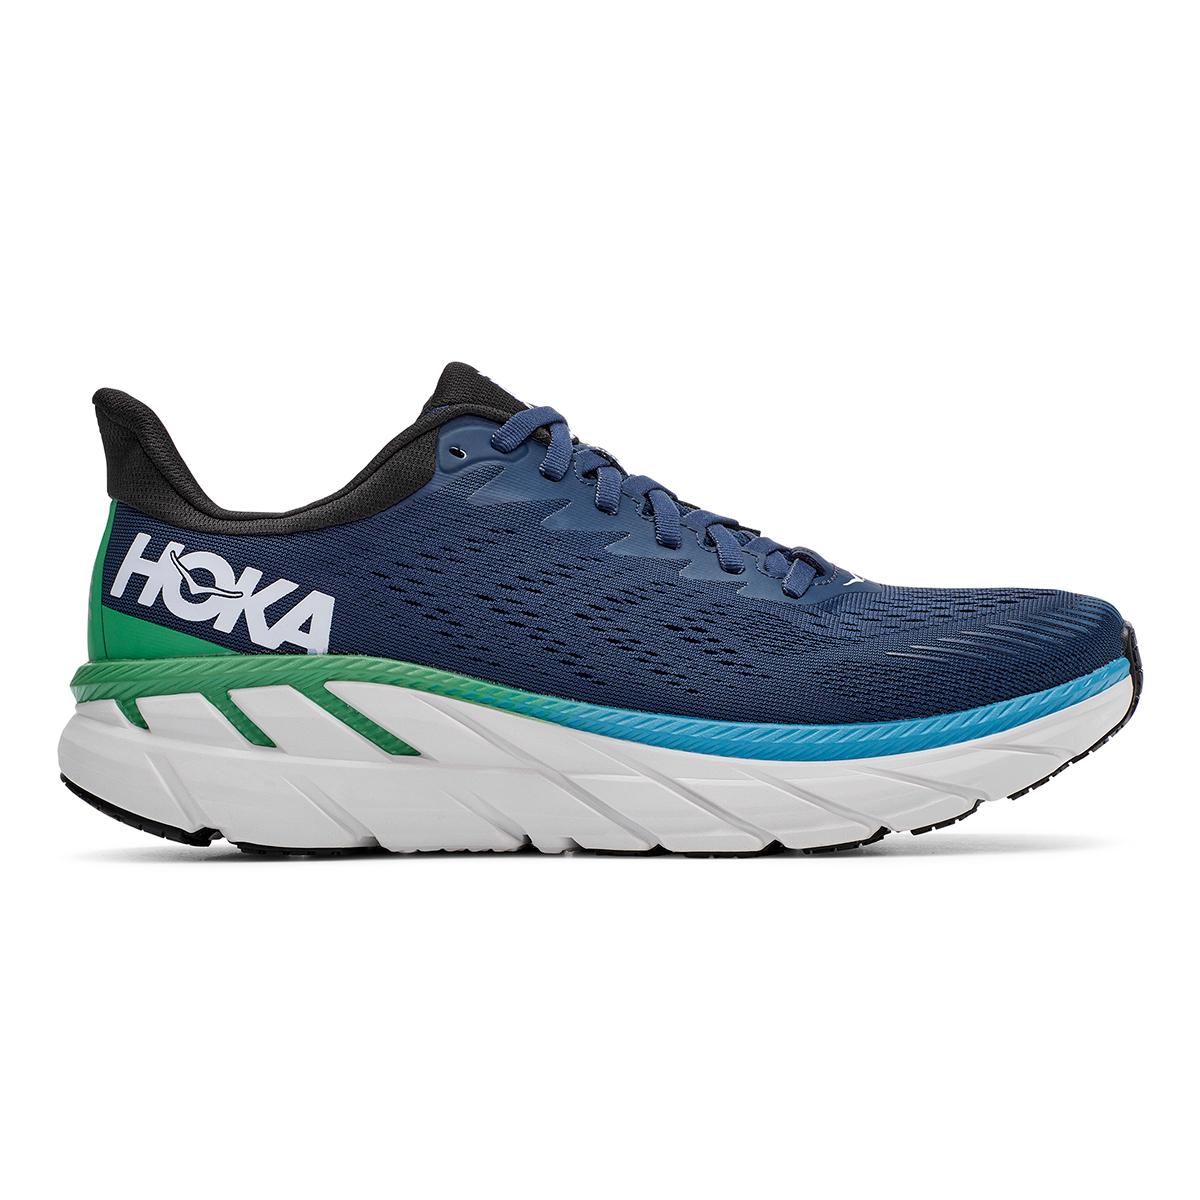 Men's Hoka One One Clifton 7 Running Shoe - Color: Moonlit Ocean/Anthracite - Size: 7 - Width: Regular, Moonlit Ocean/Anthracite, large, image 1